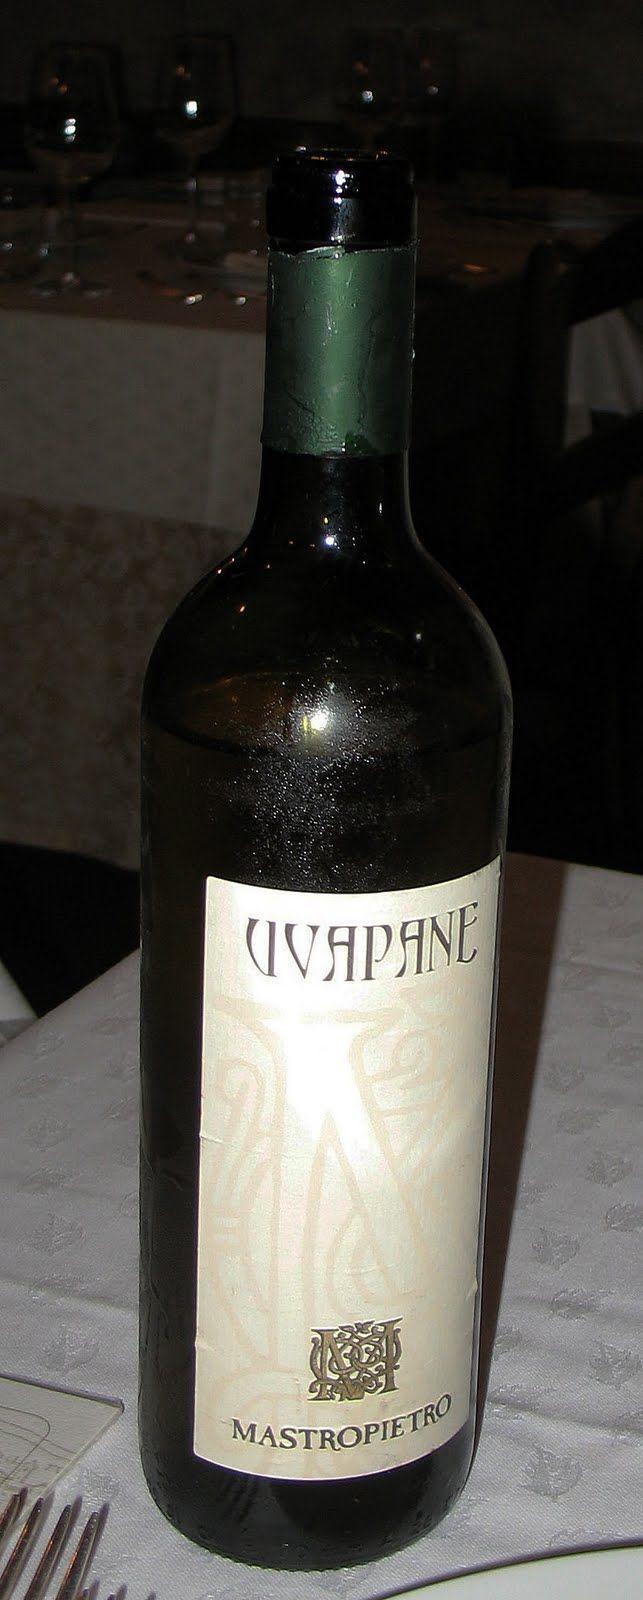 Uvapane White Wine - Excellent